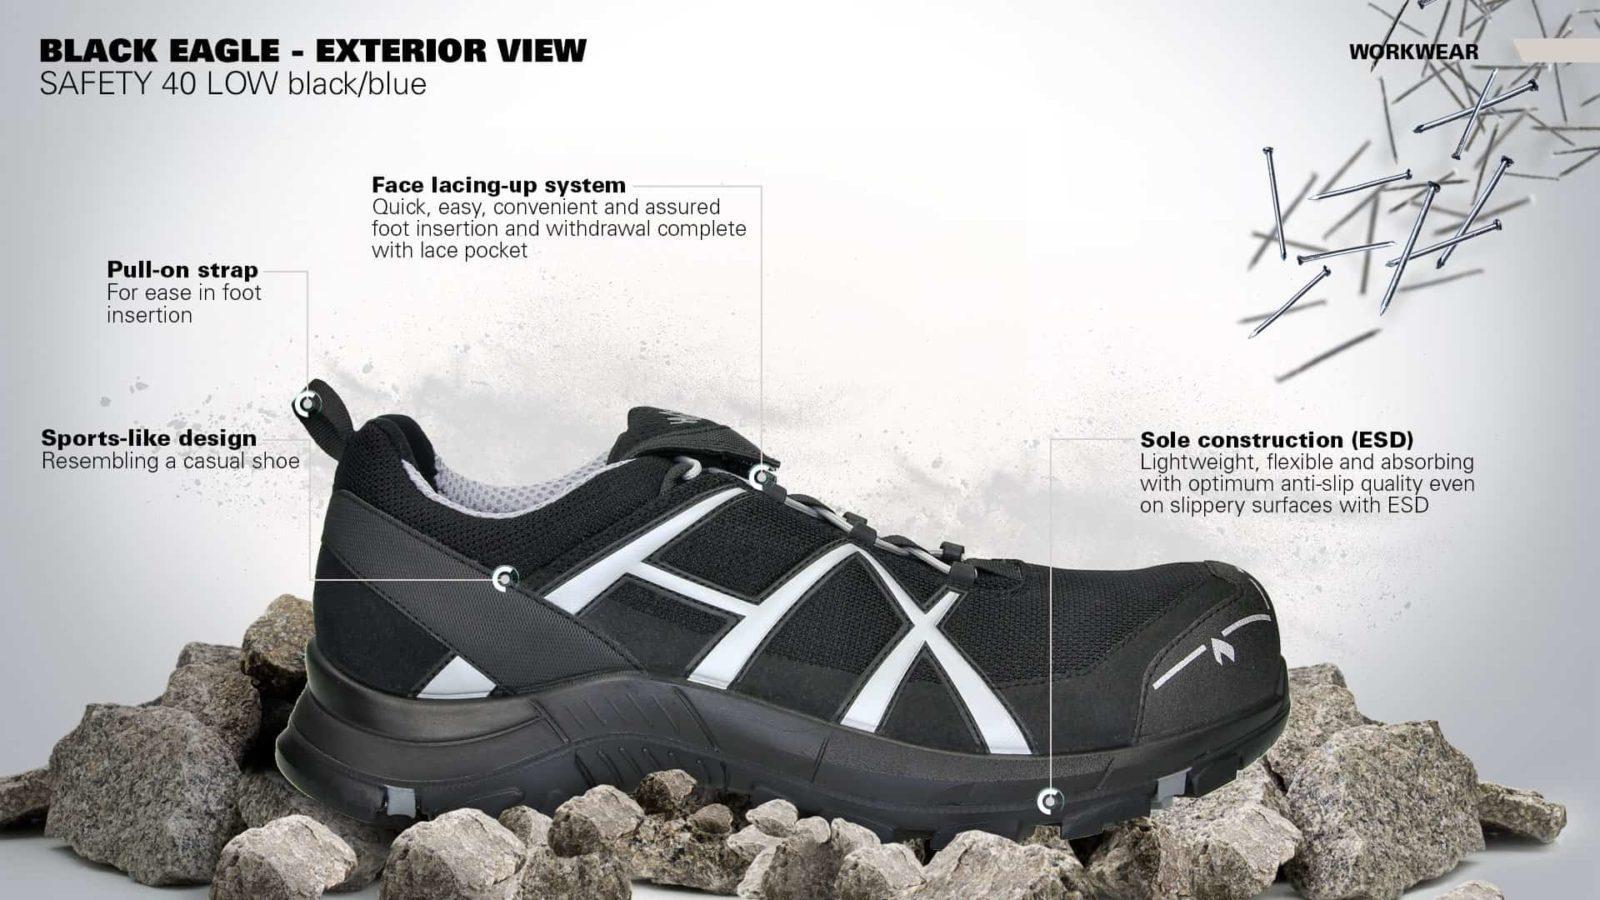 HAIX Black Eagle Safety 41 low black silver - Buty Haix - Sklep krismark 6e338fda19